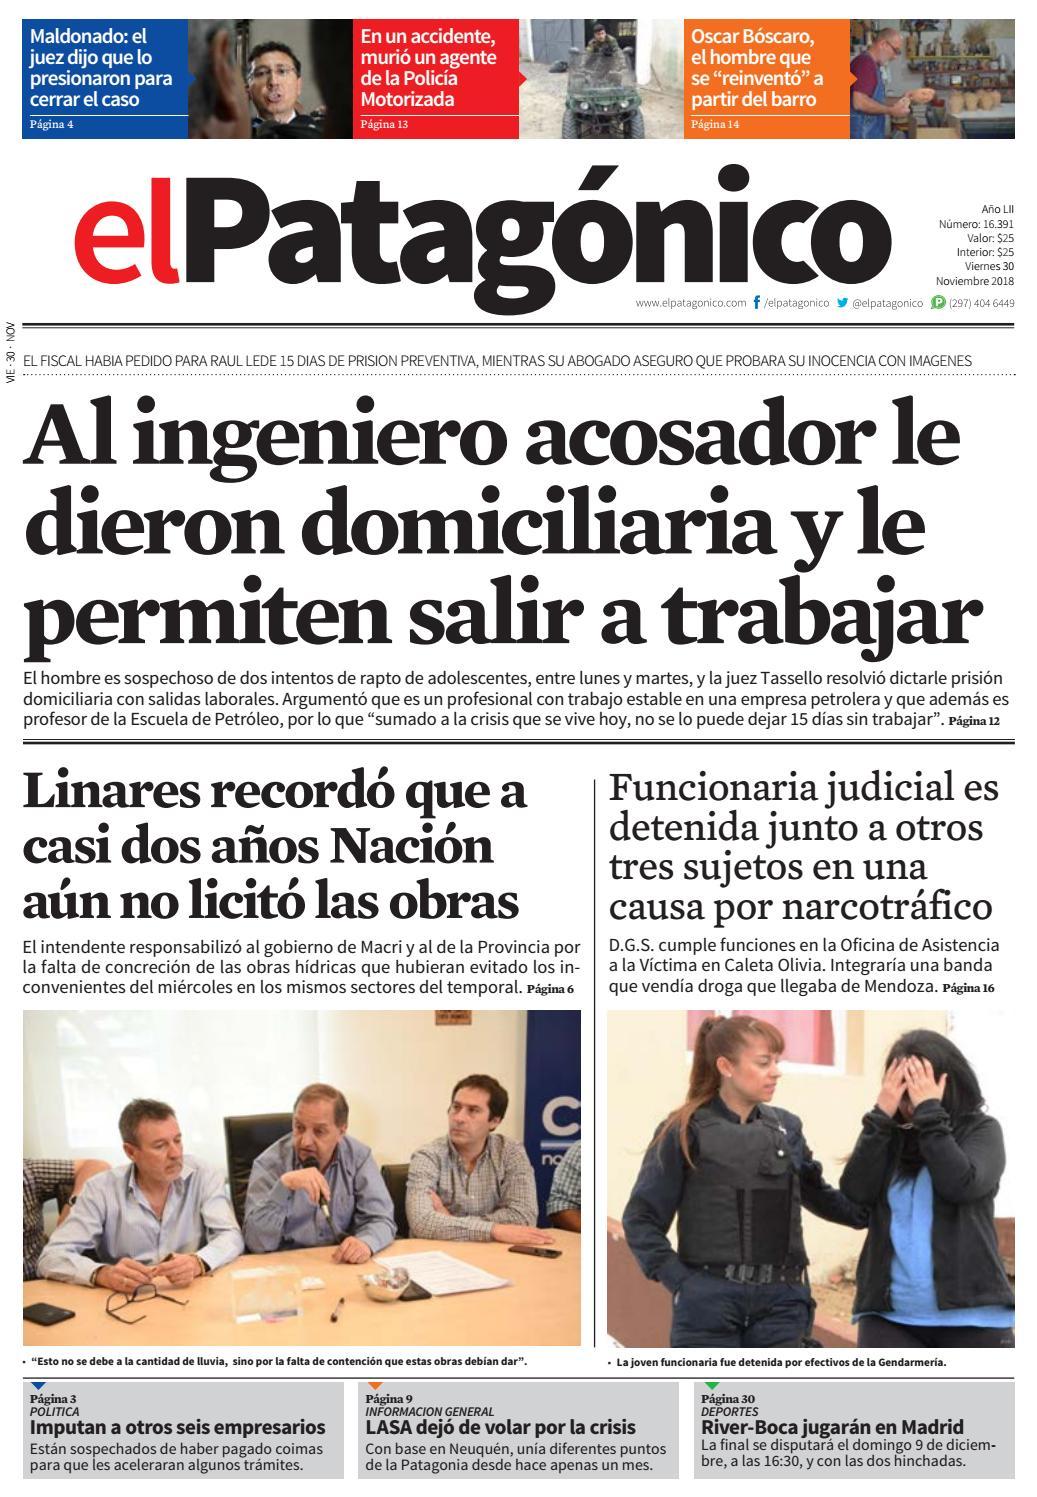 edicion215729112018.pdf by El Patagonico - issuu 4d89683789e6a